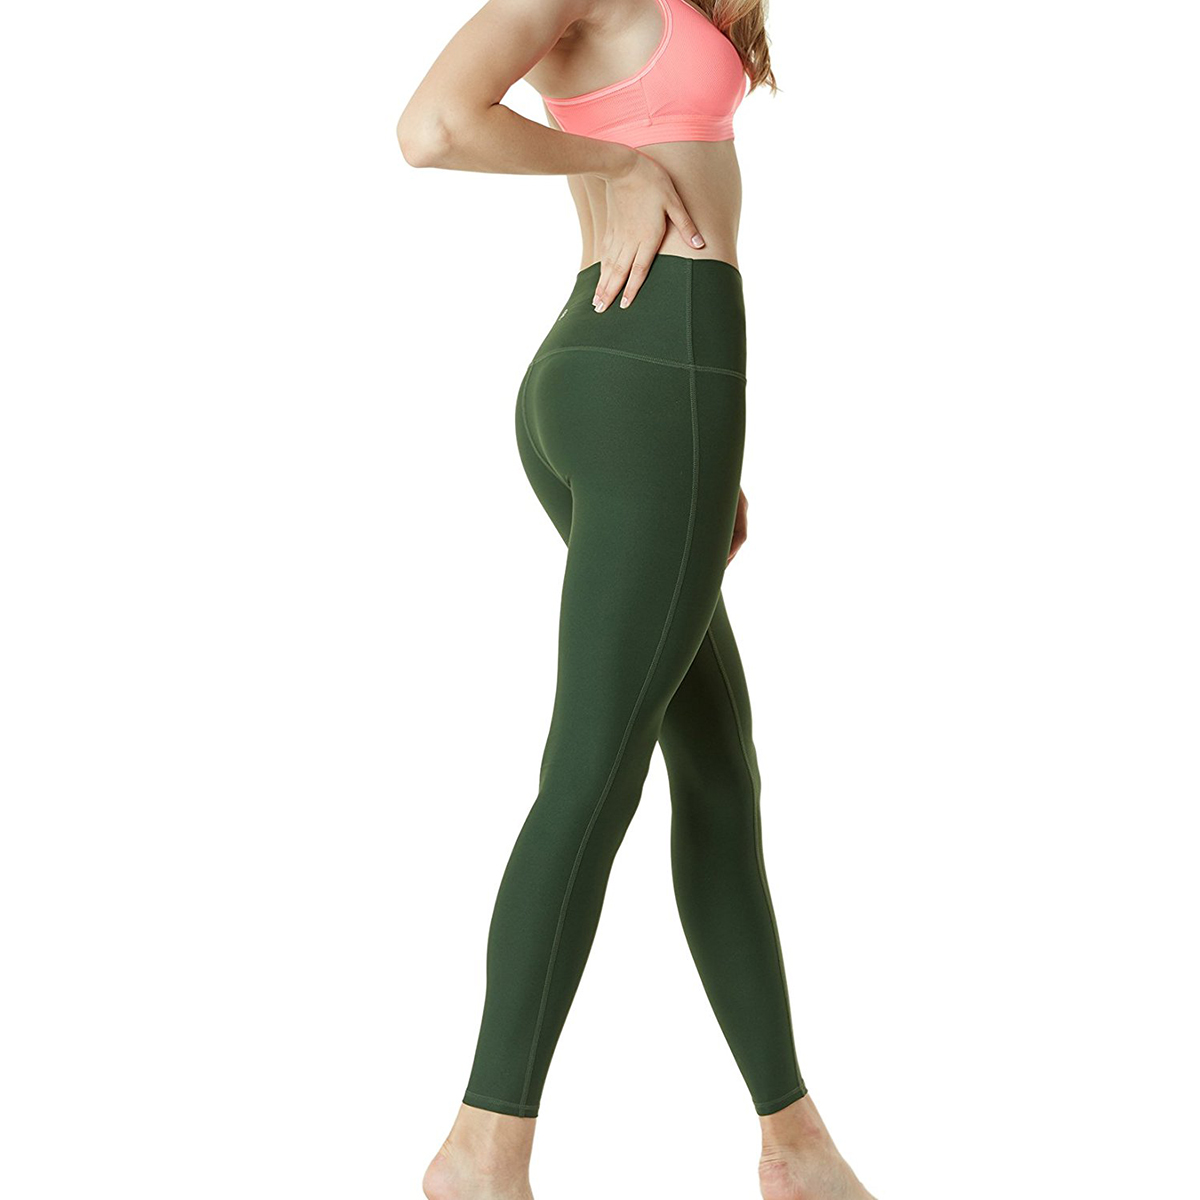 thumbnail 56 - TSLA Tesla FYP42 Women's High-Waisted Ultra-Stretch Tummy Control Yoga Pants